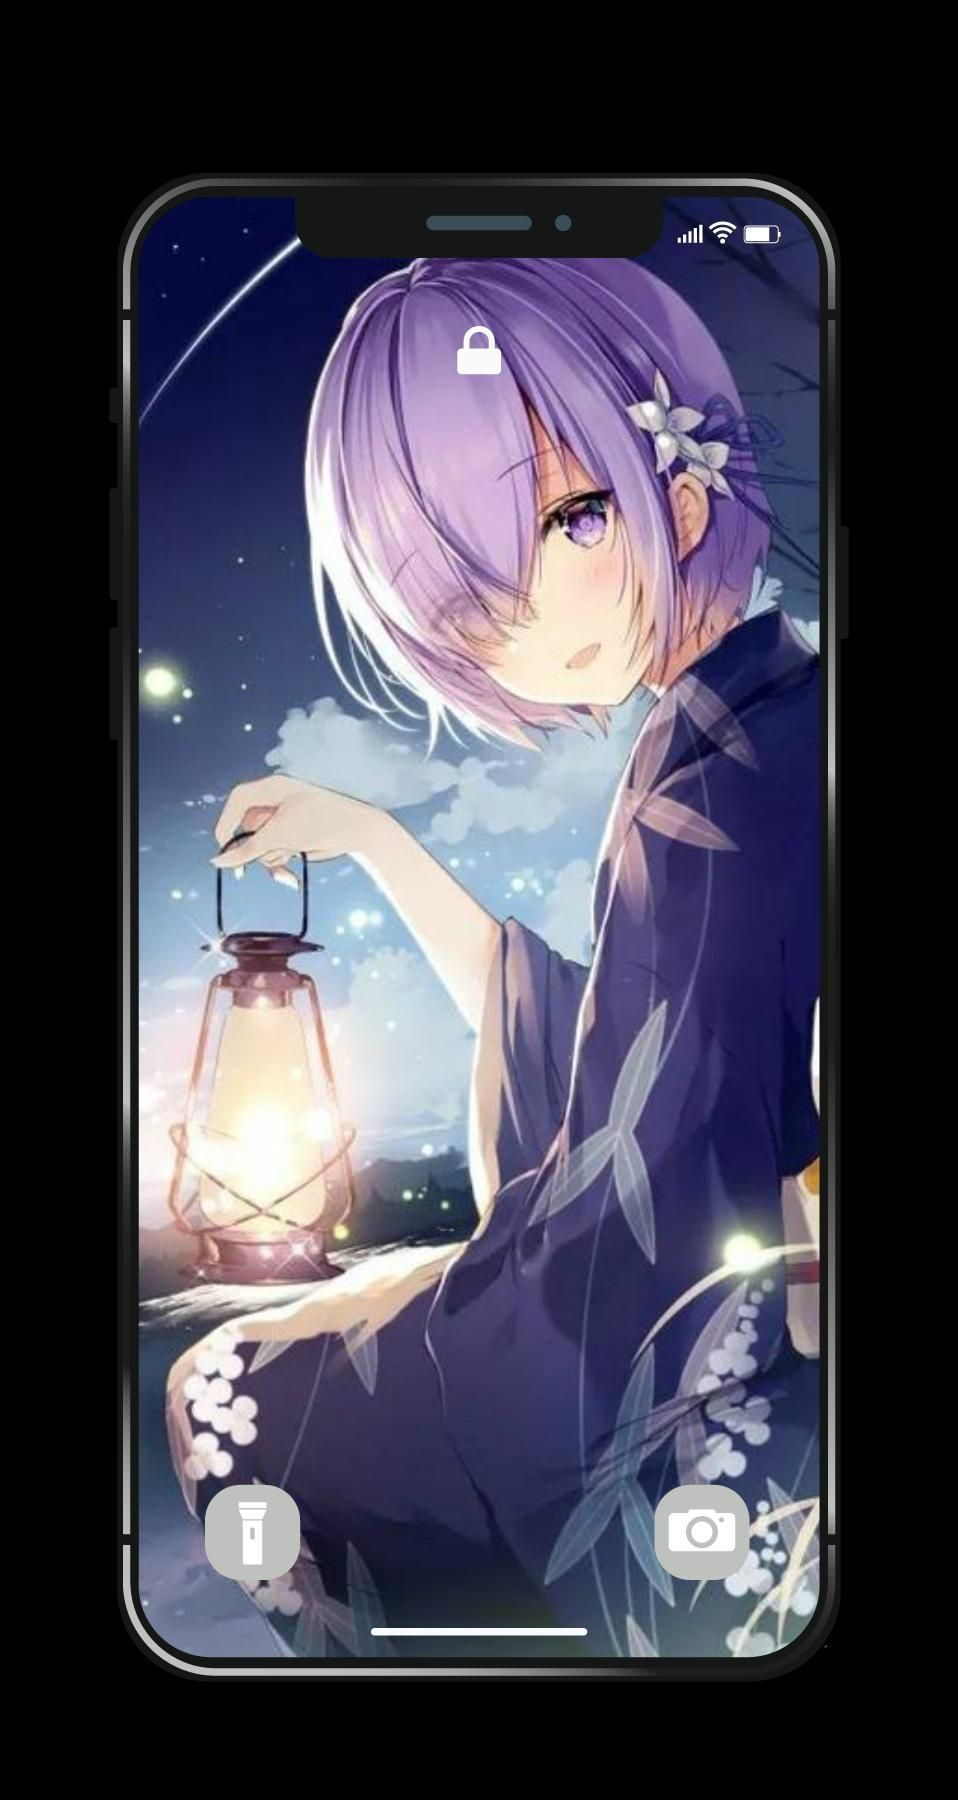 Samsung Wallpaper Anime Hintergrundbild Tapete High Quality Anime Wallpaper Ph 4k In 2020 With Images Anime Wallpaper Phone Hd Anime Wallpapers Samsung Wallpaper